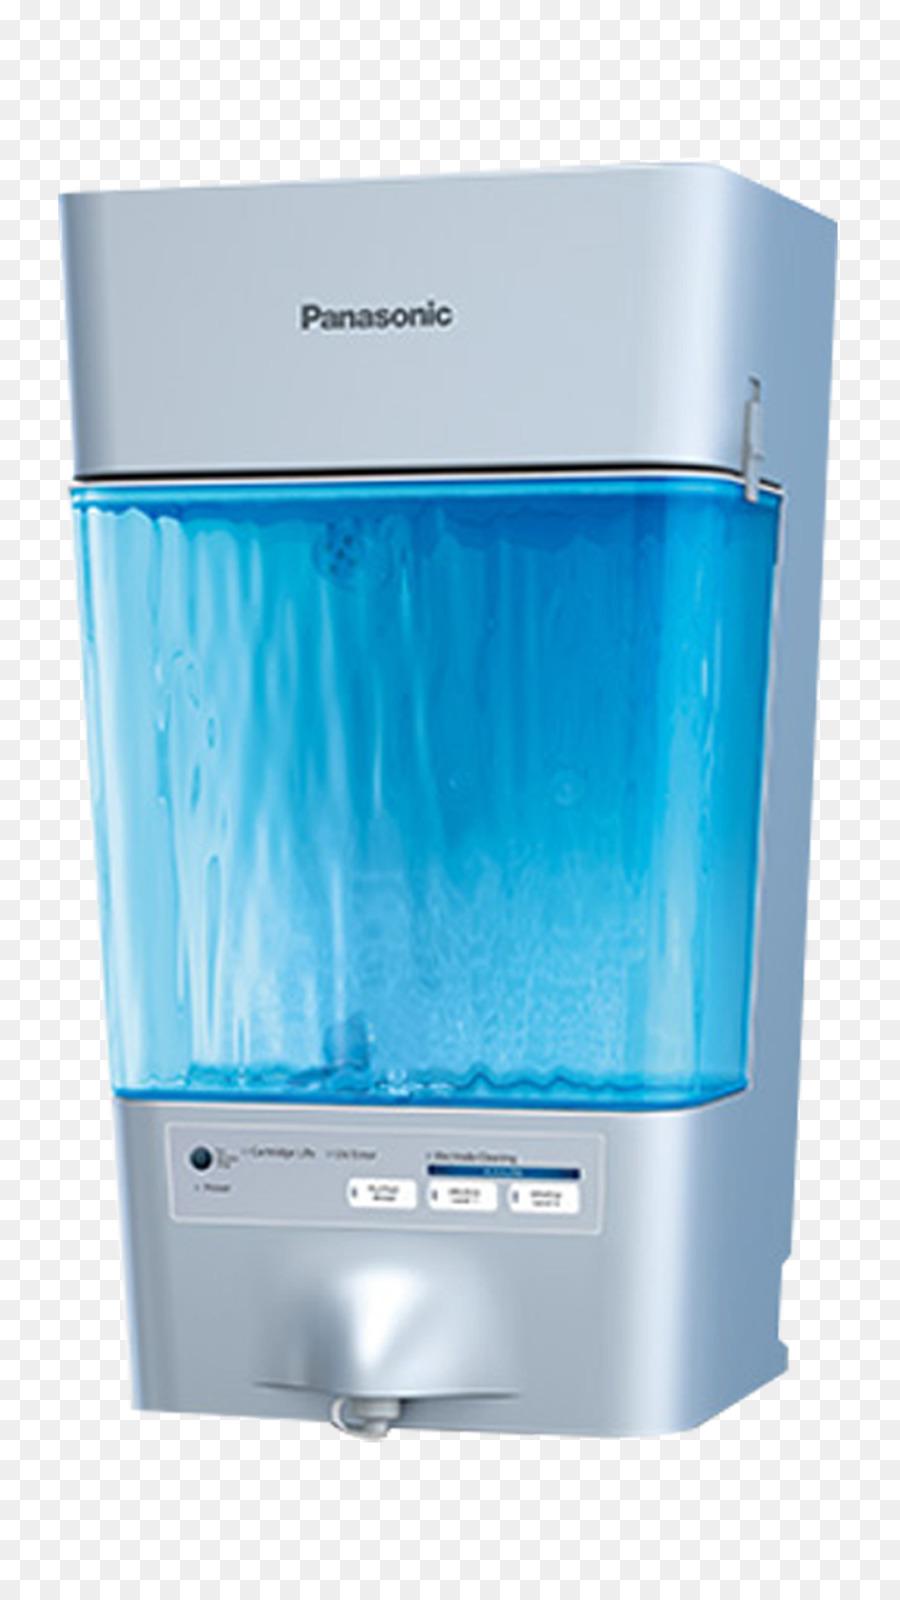 Water Filter Panasonic India Pvt Ltd Water purification Reverse ...